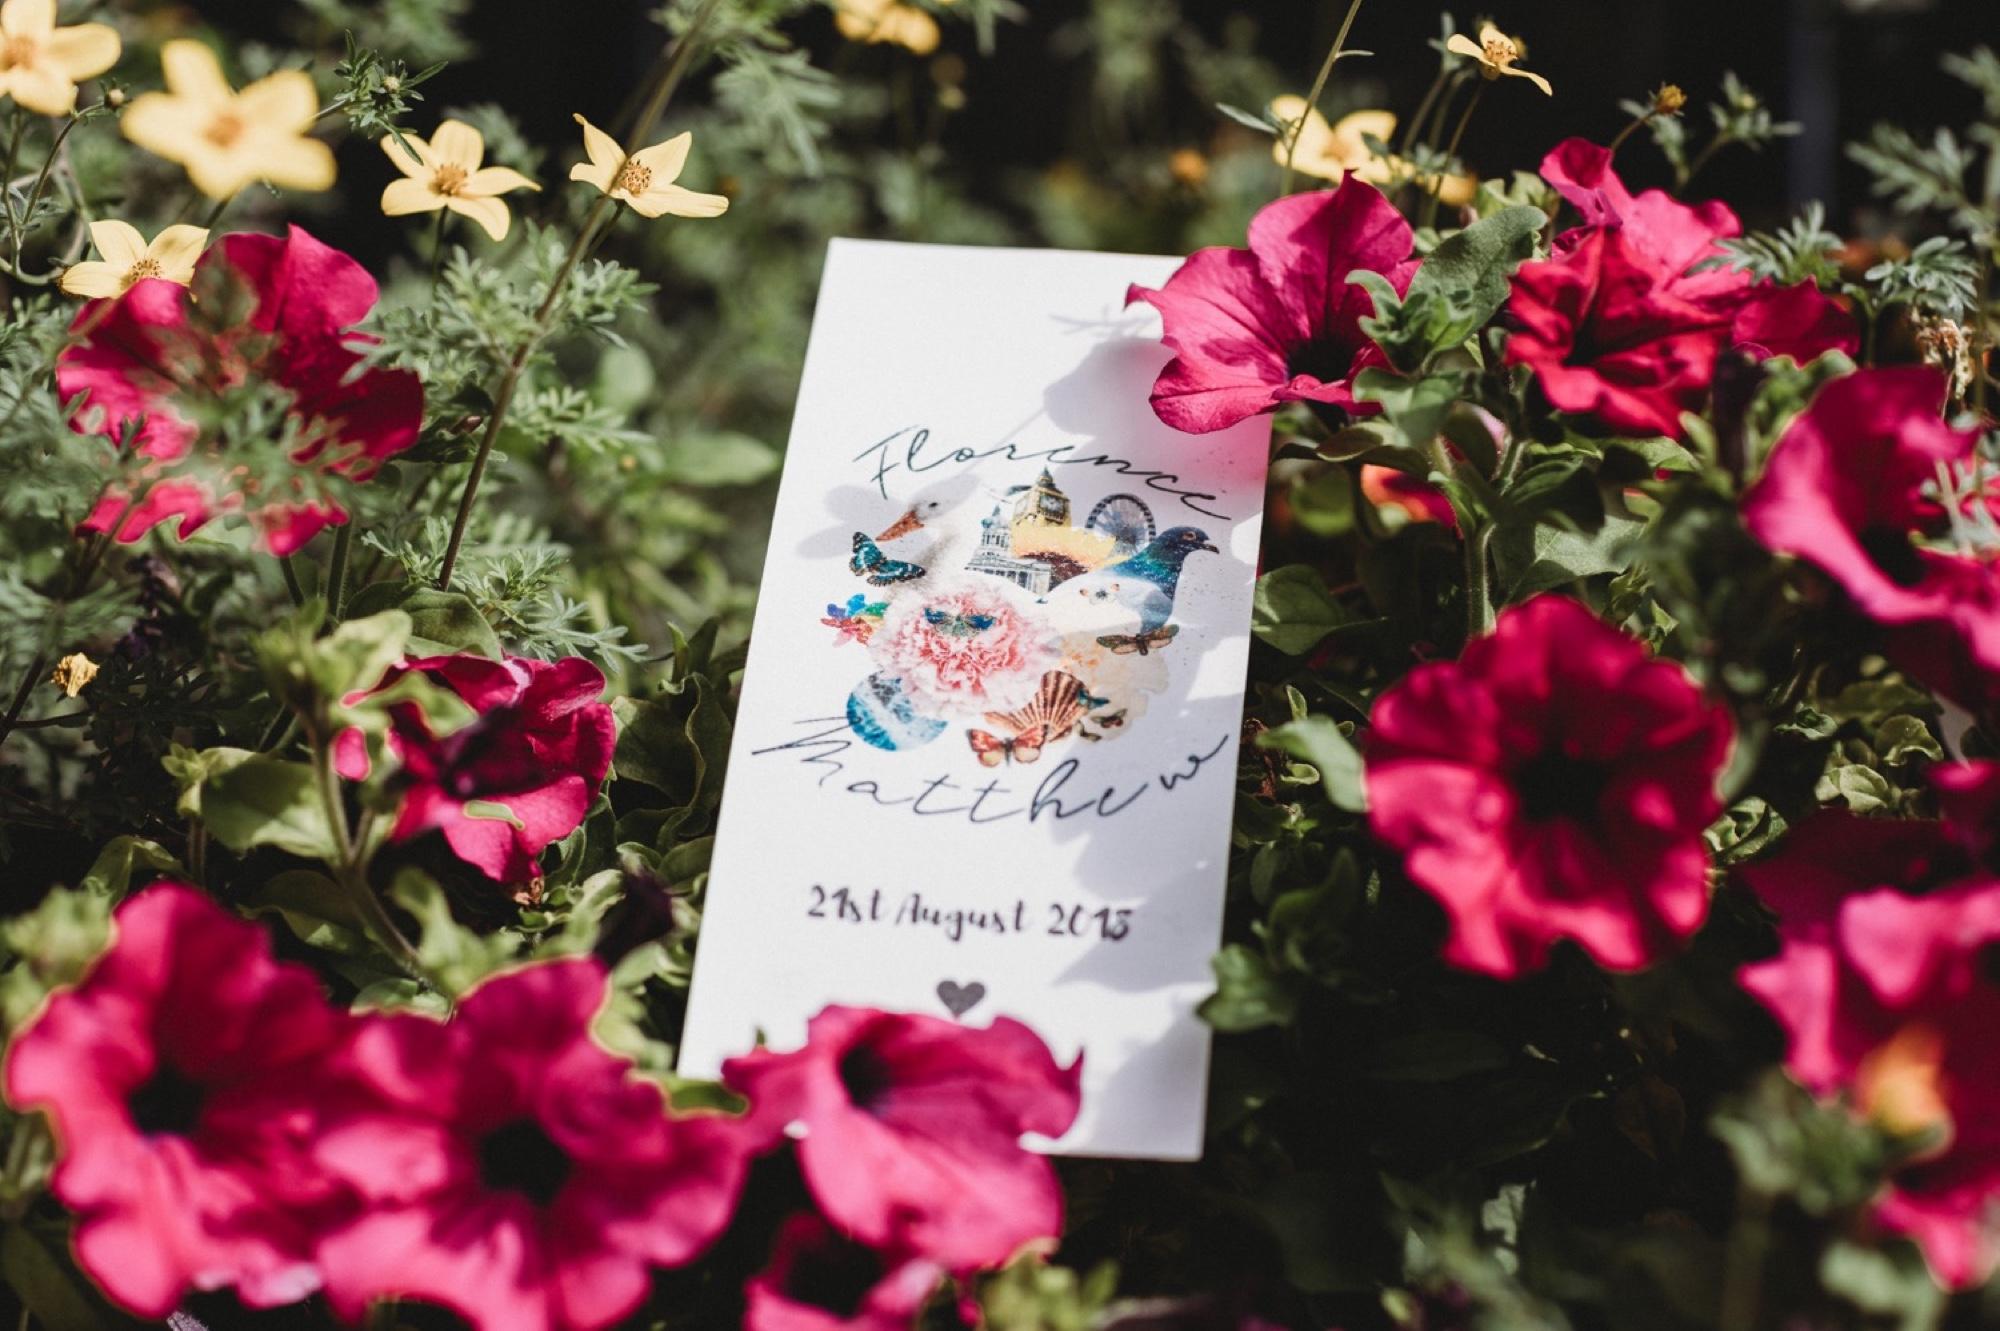 hackney London wedding invitation by zakas photography